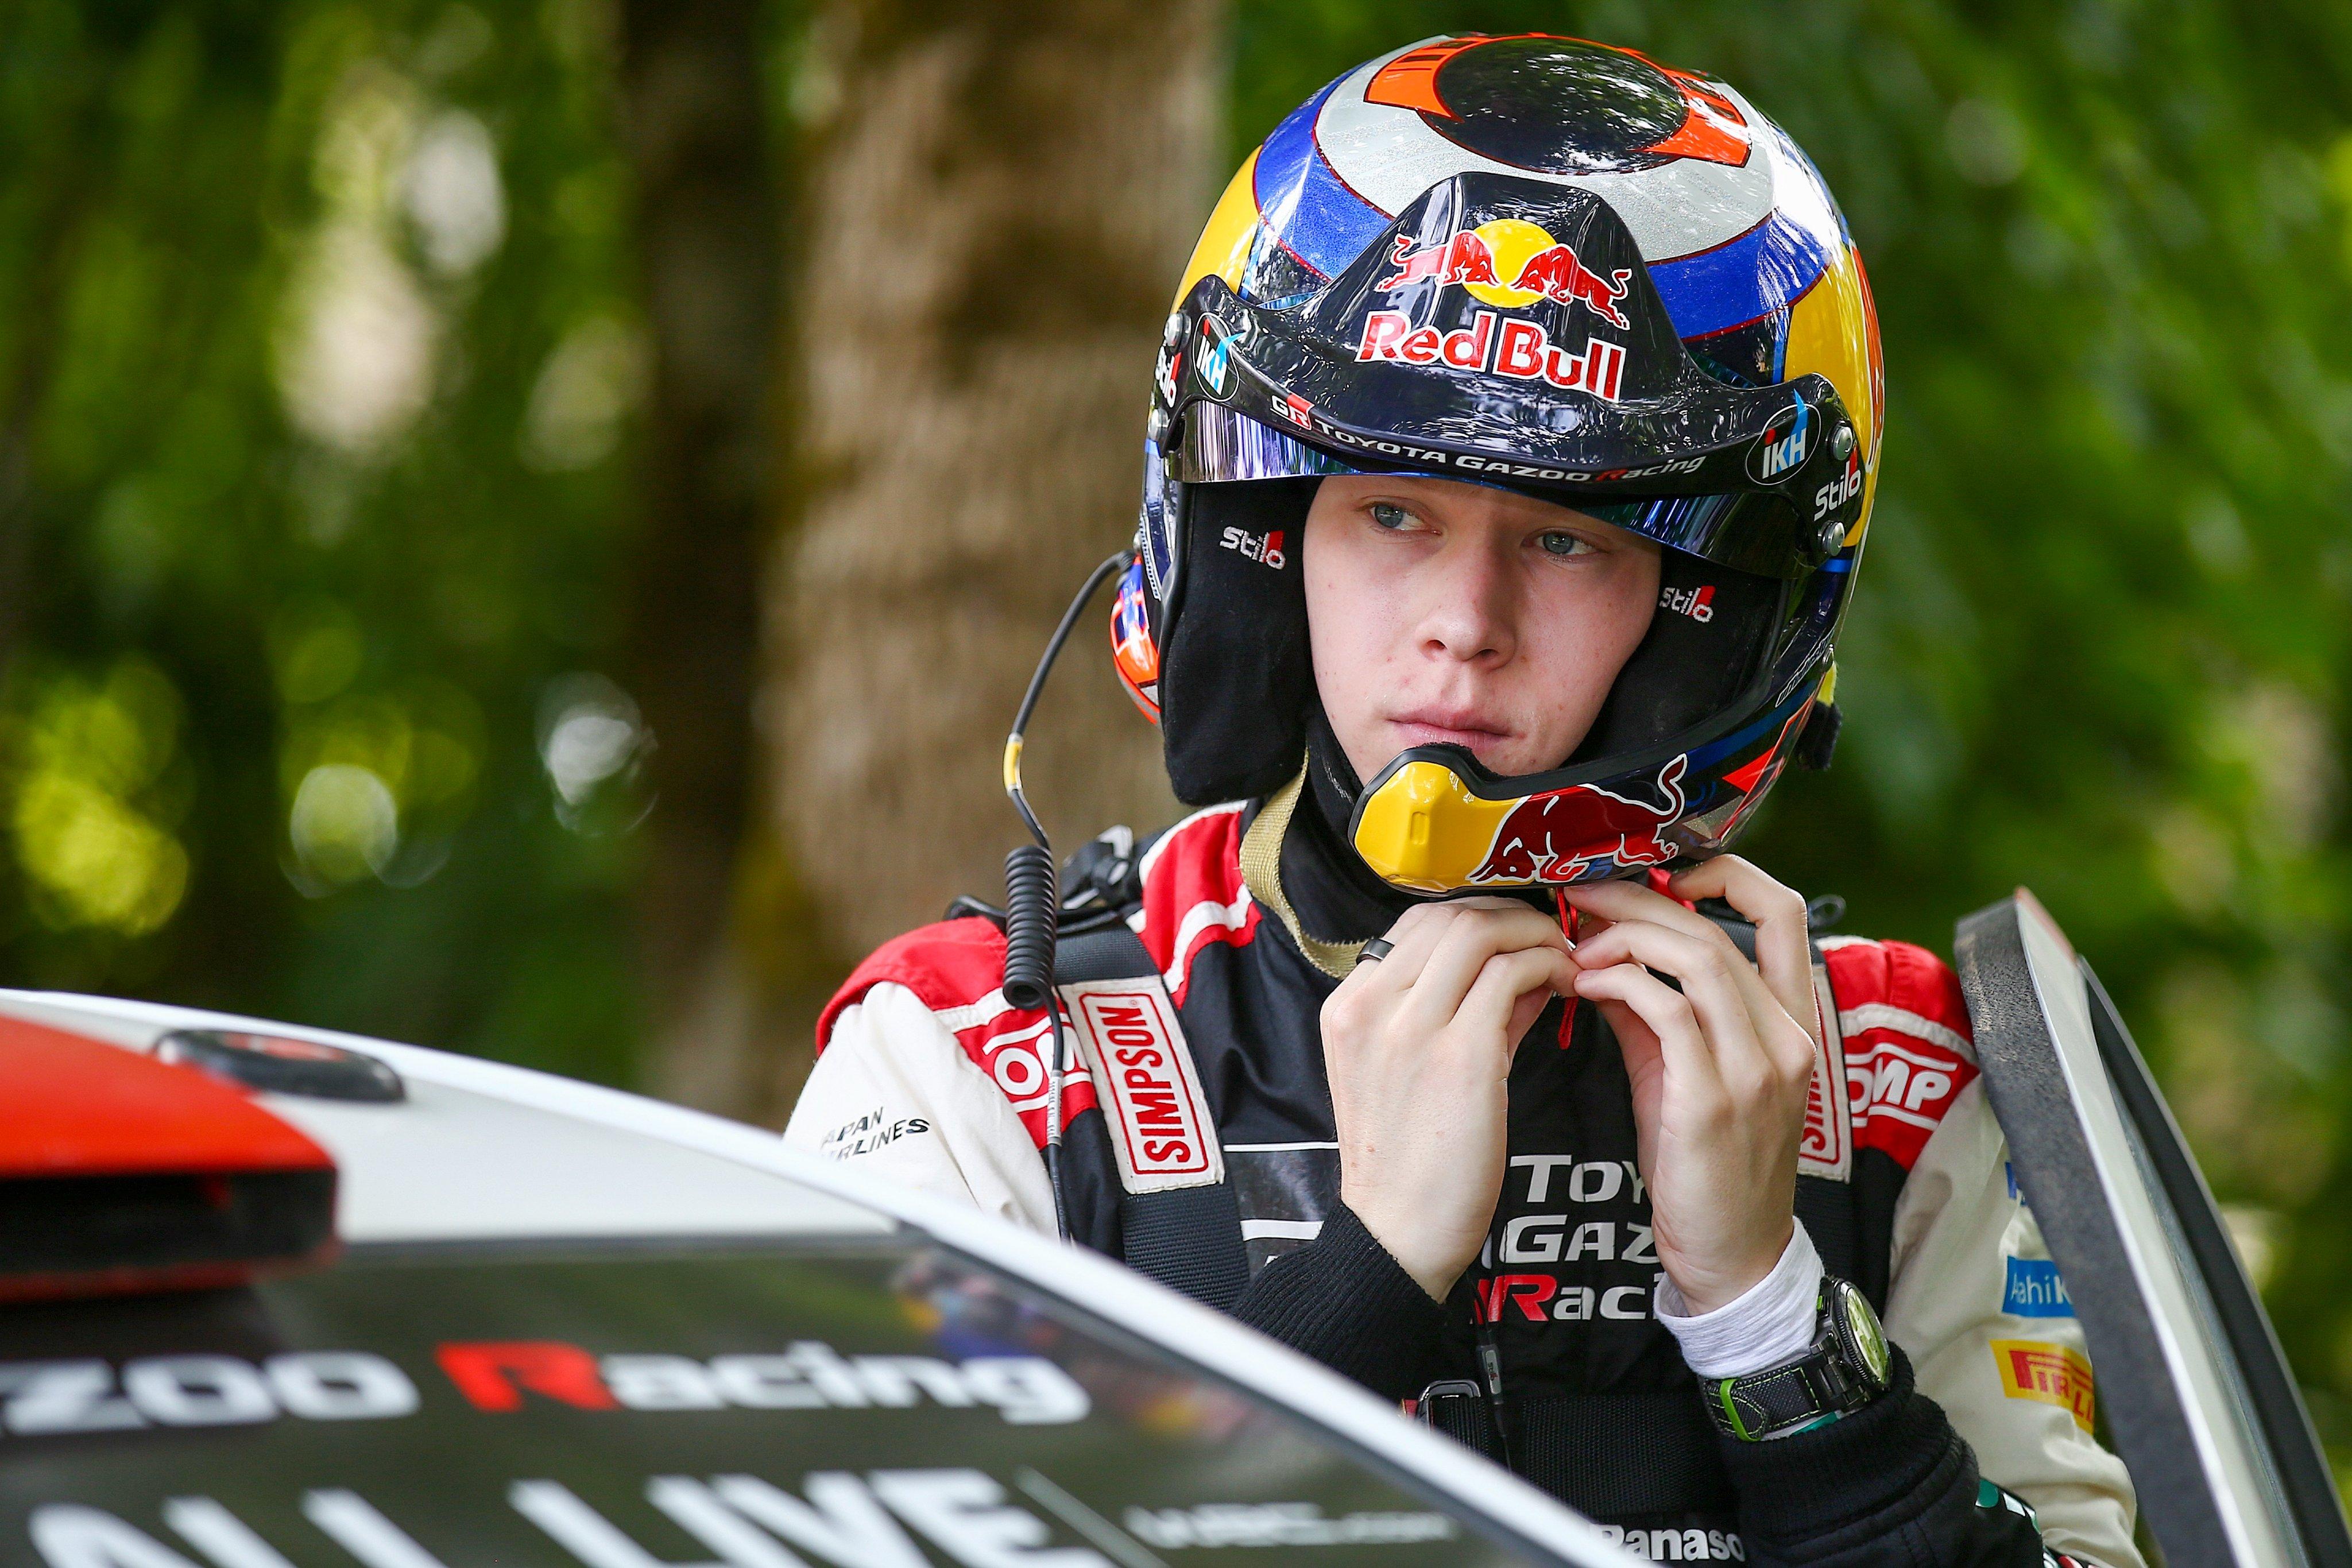 WRC: 11º Rally Estonia [15-18 Julio] - Página 3 E6e_fzLX0AA3hrg?format=jpg&name=4096x4096